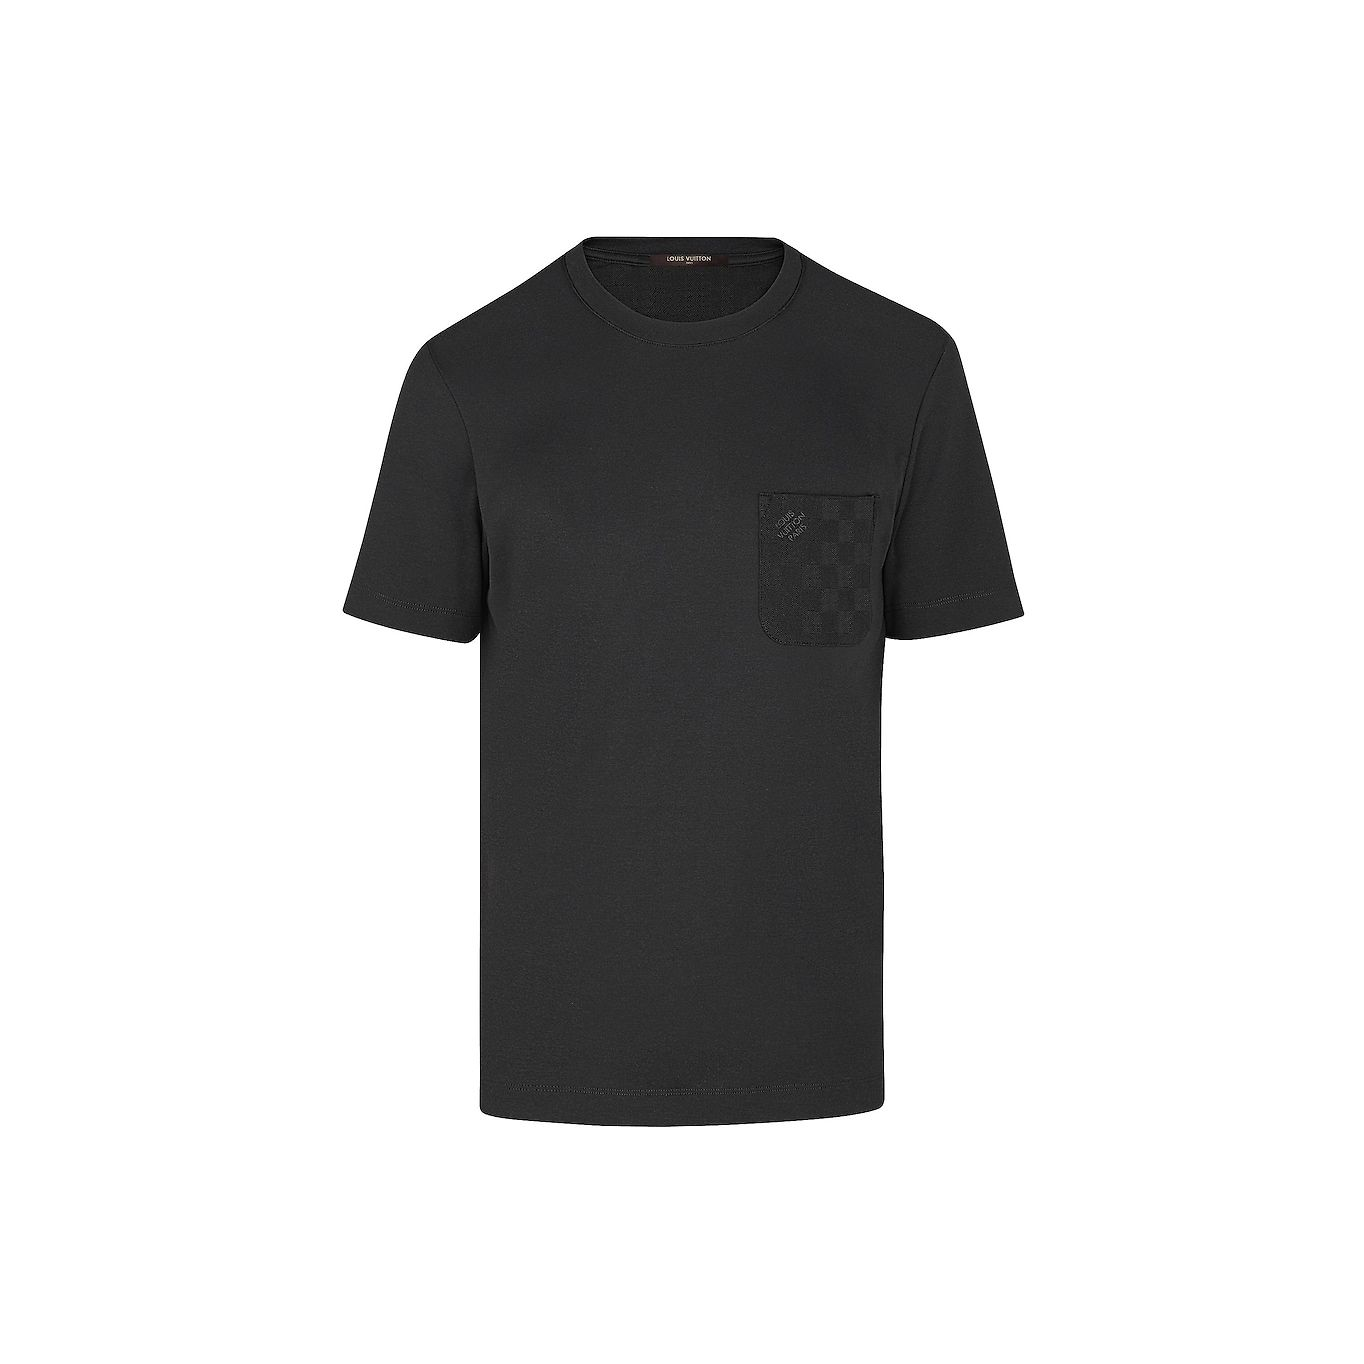 0ba942d9d0 Damier pocket crew neck | XIII | Shirts, Louis vuitton, Crew neck